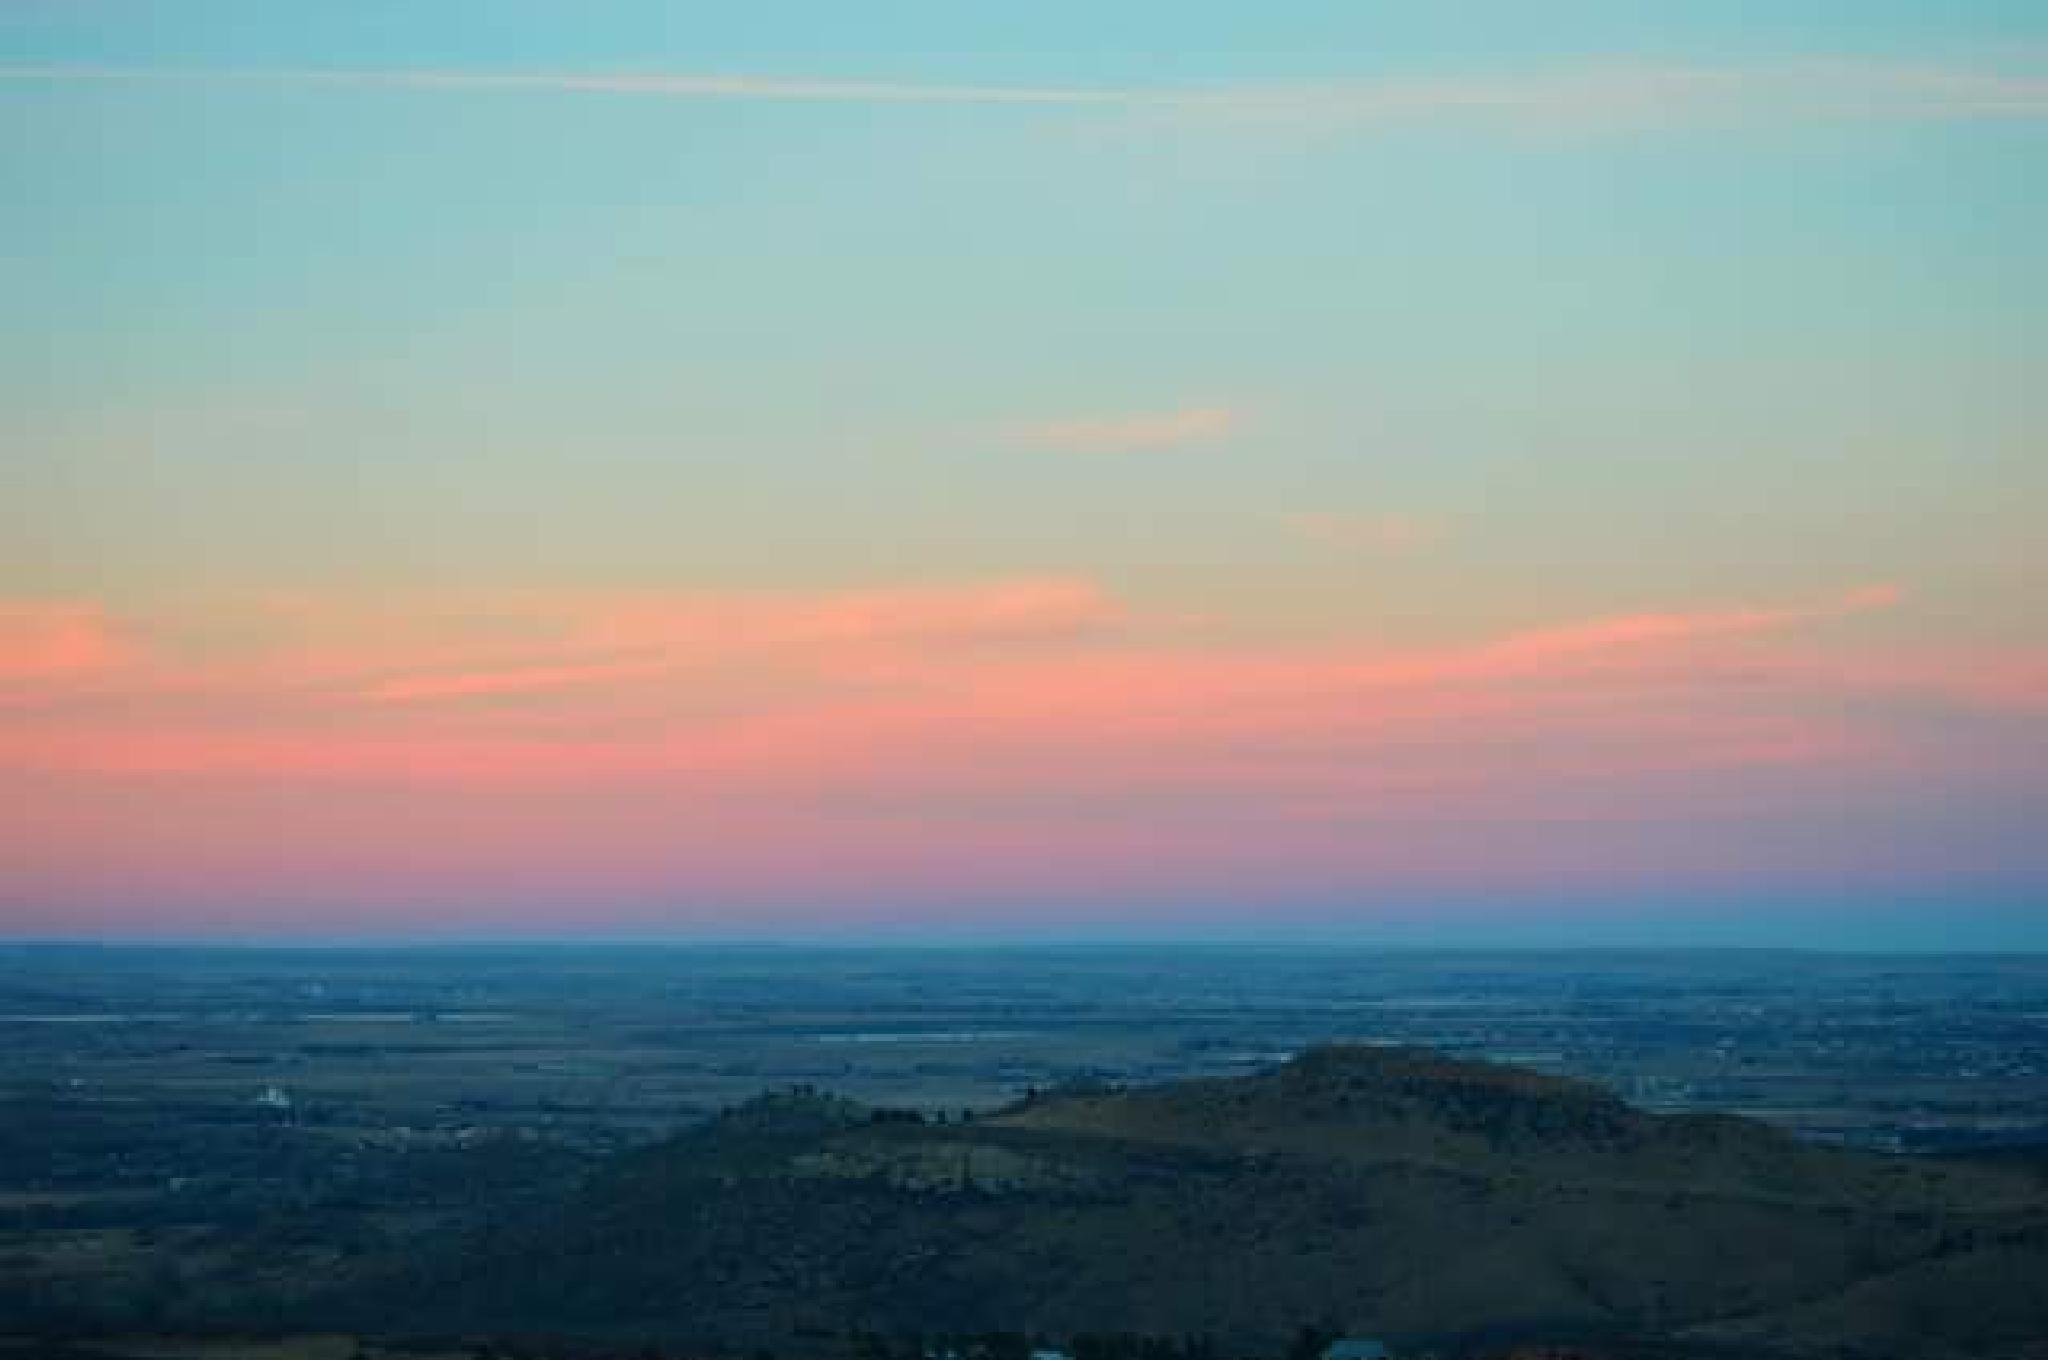 sunset by Gigi